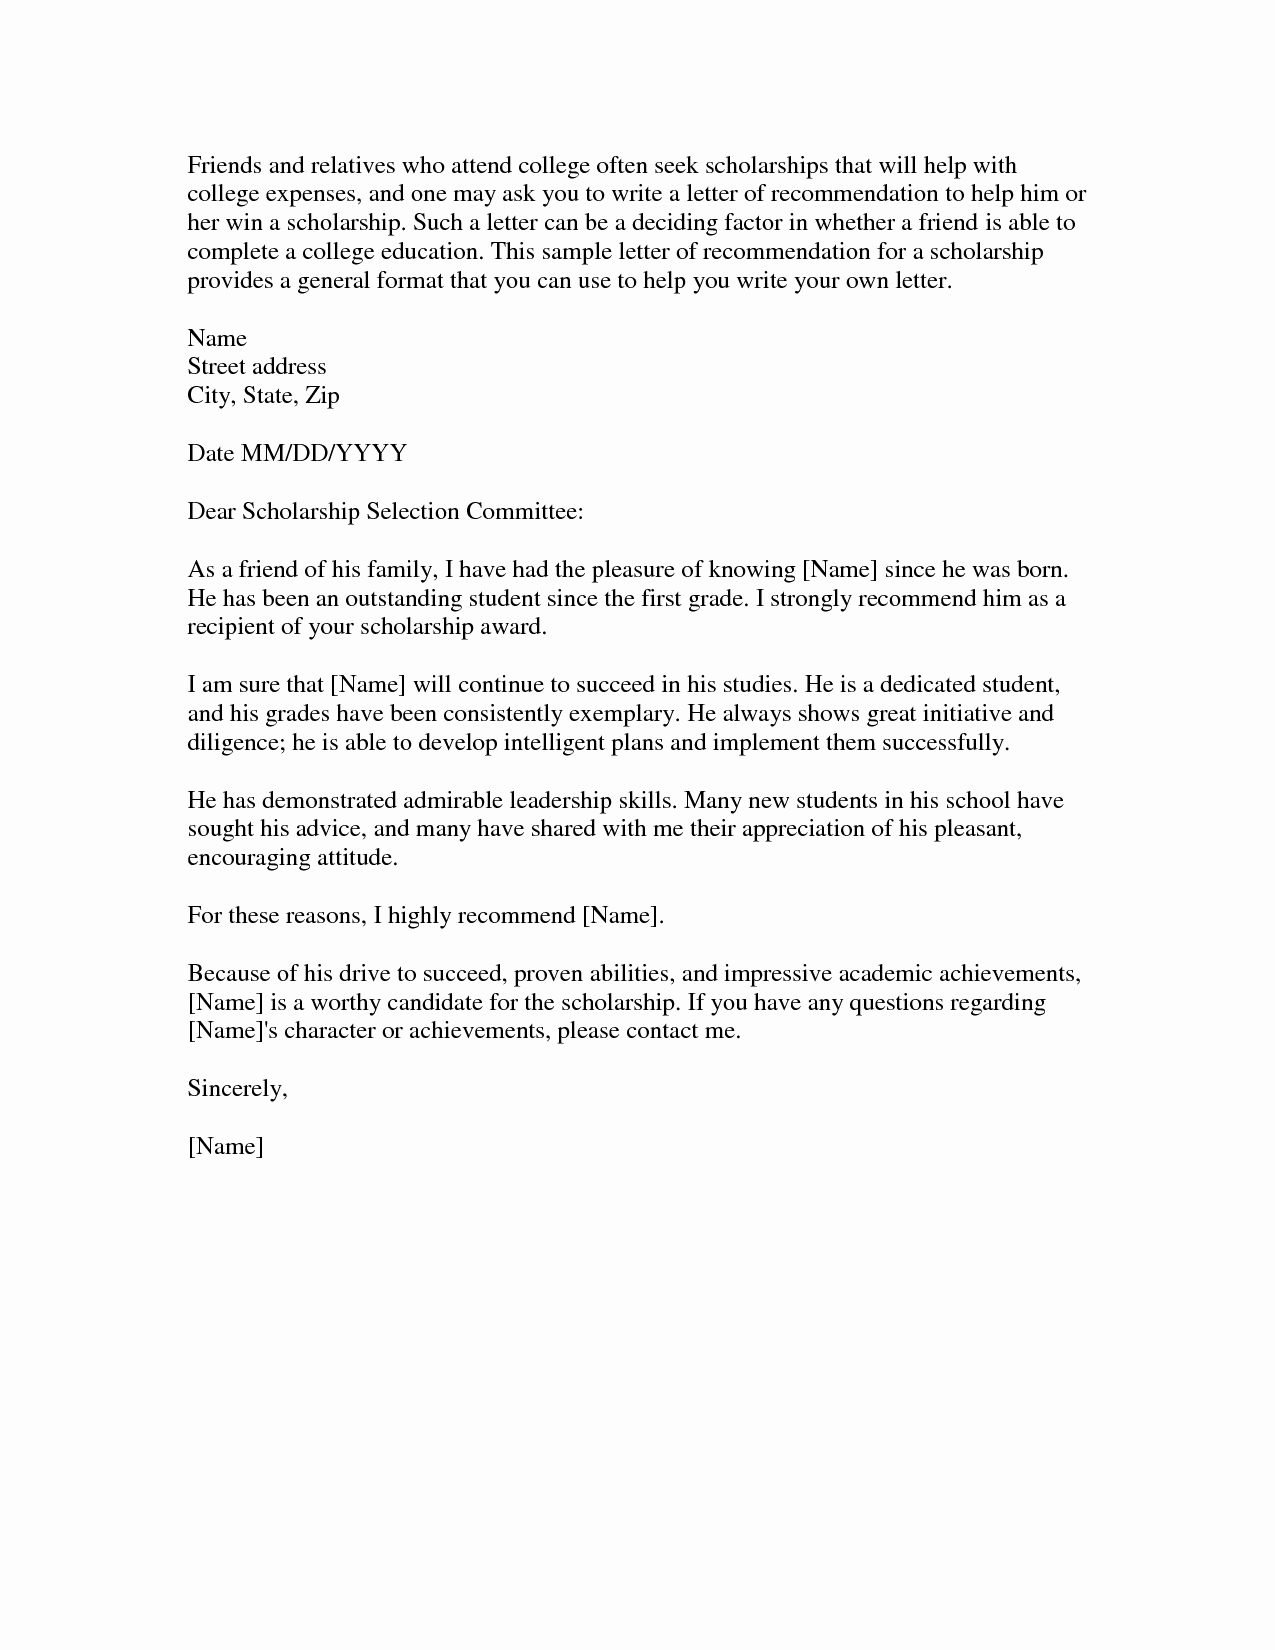 Nih Letter Of Recommendation Sample Luxury Sample Reference Letter for Grant Application